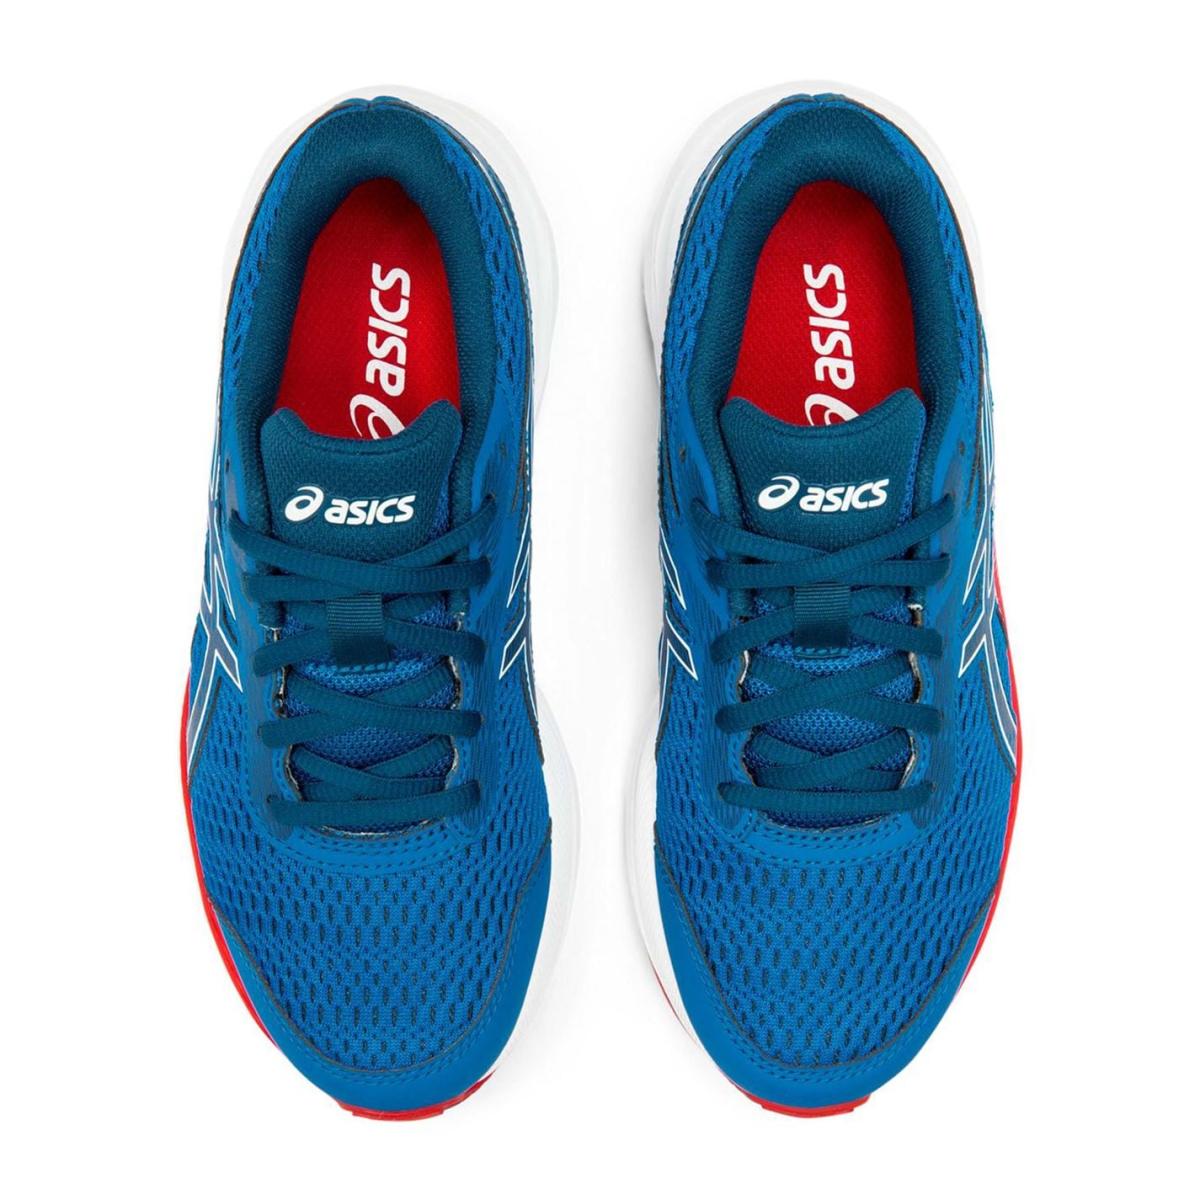 Asics-Gel-Excite-6-Turnschuhe-Laufschuhe-Jungen-Kinder-Sneaker-Sportschuhe-7026 Indexbild 4